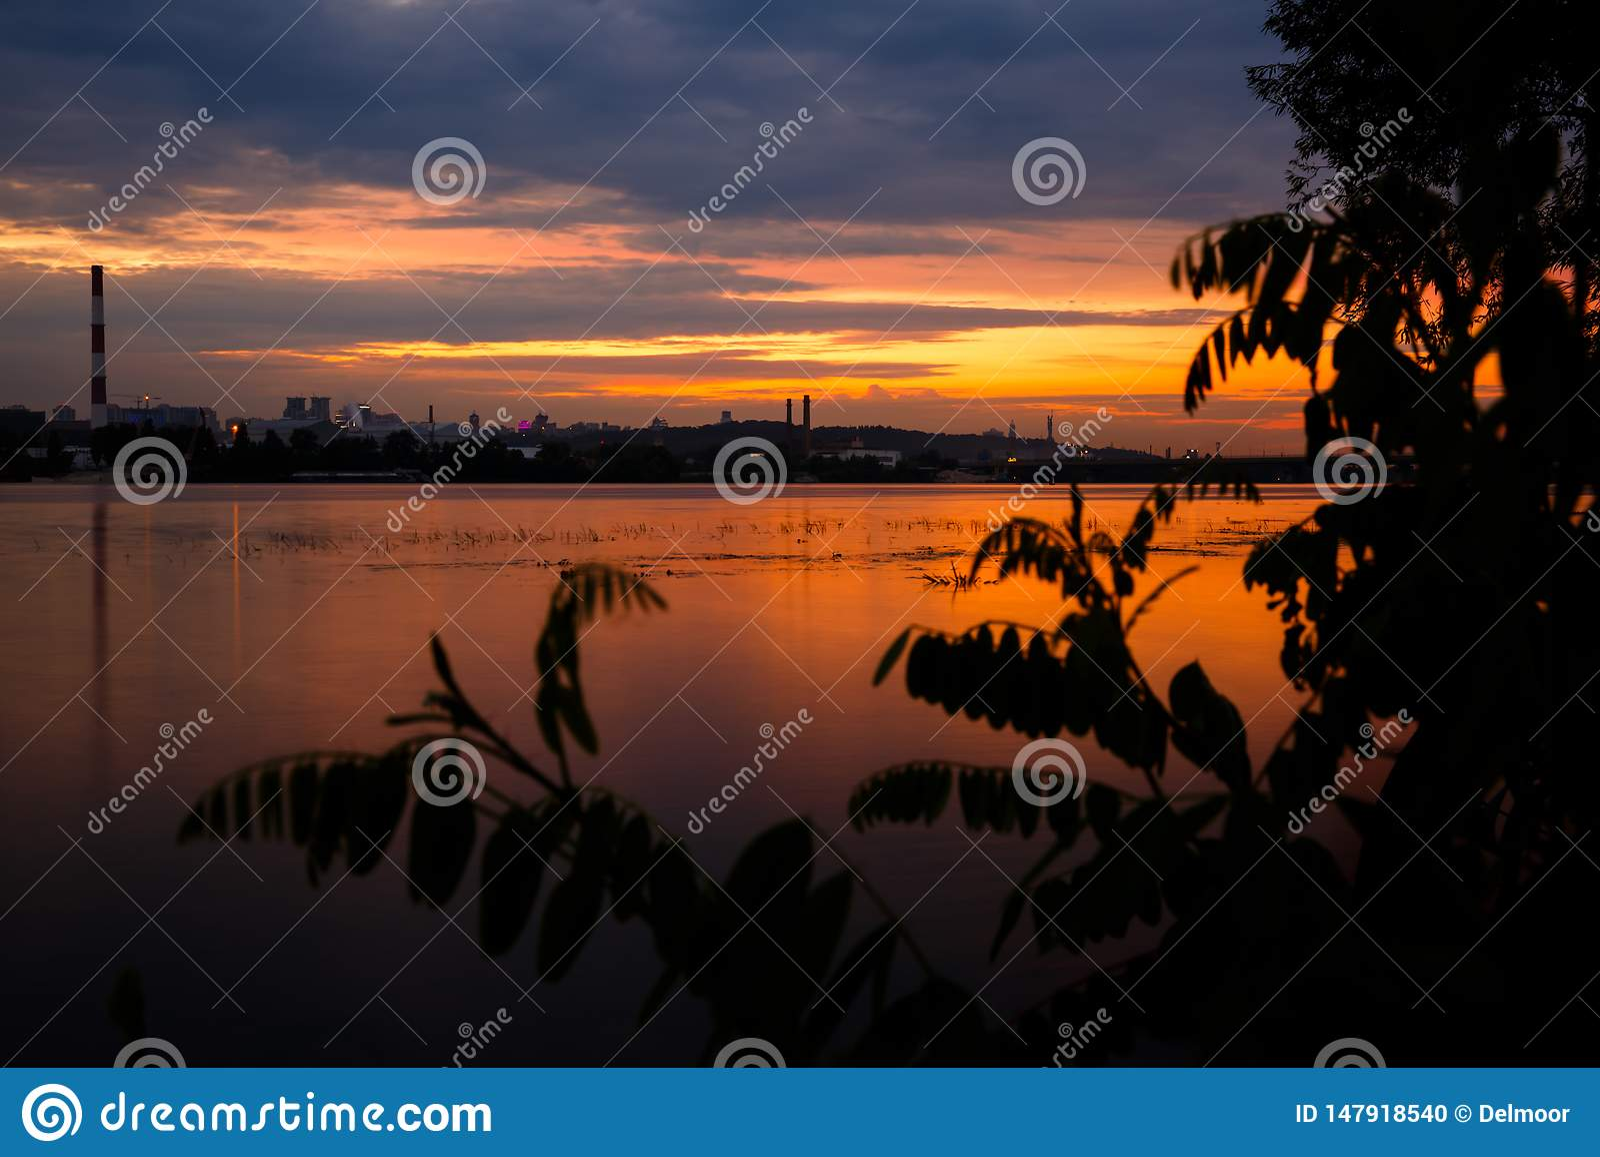 Sunset landscape over Dnipro river against Kyiv cityscape